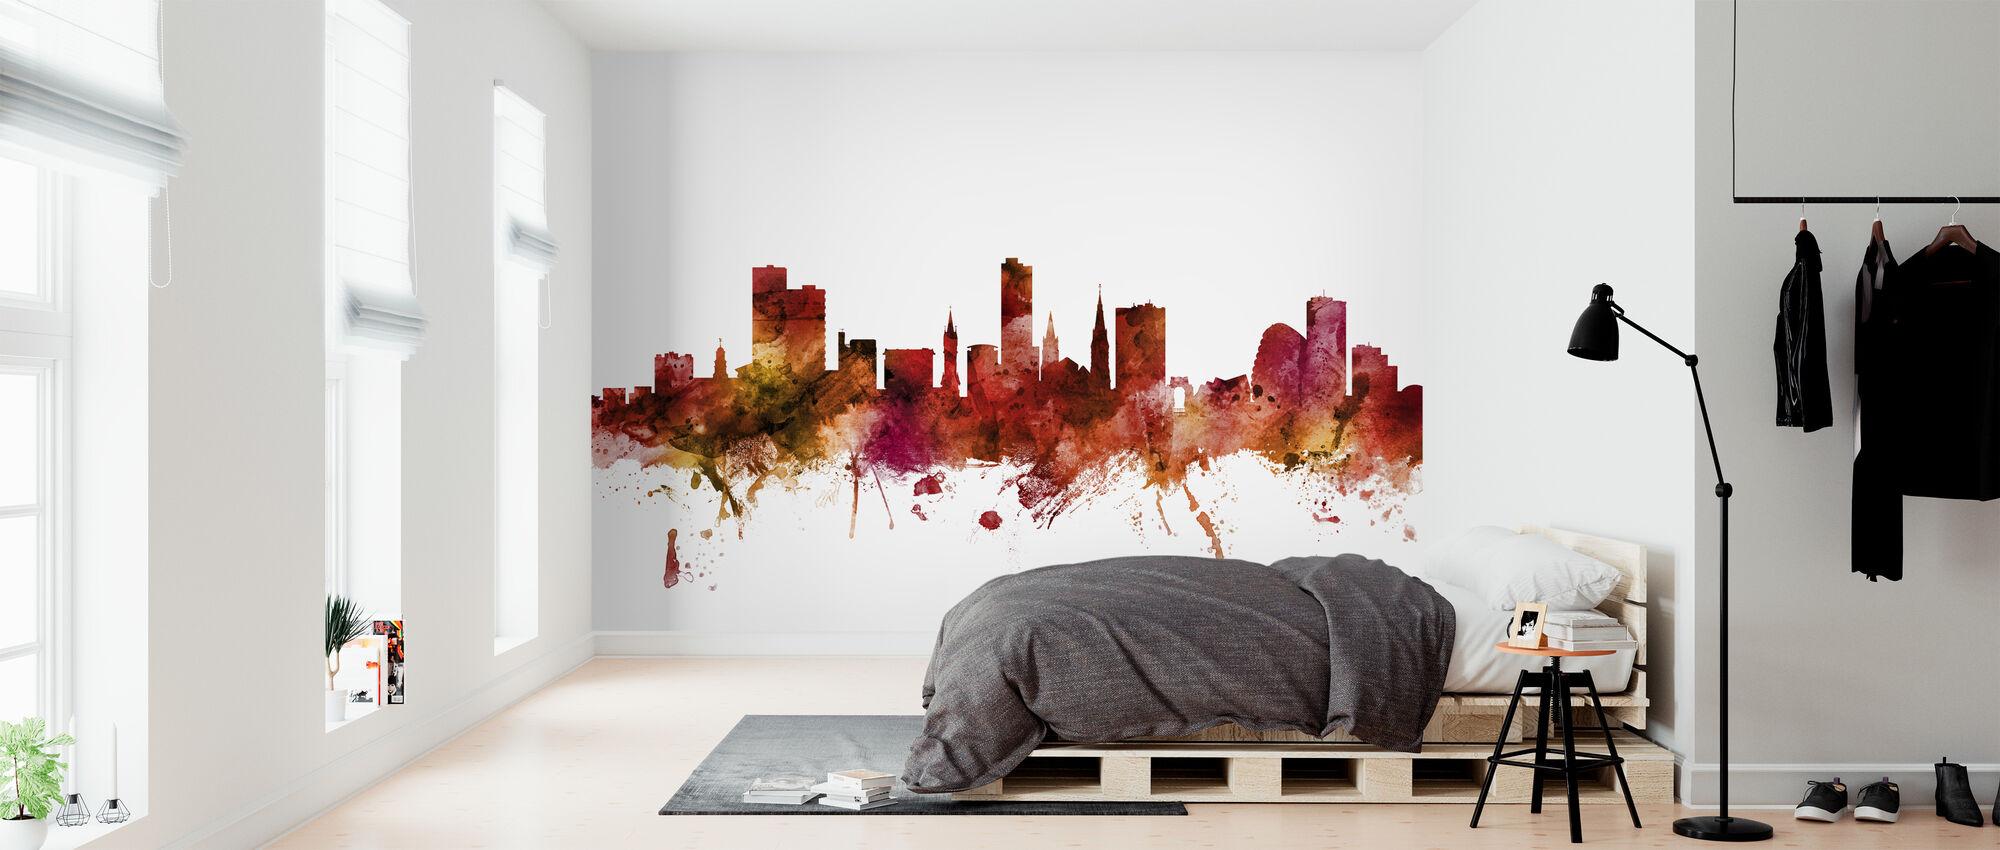 Leicester England Skyline - Wallpaper - Bedroom